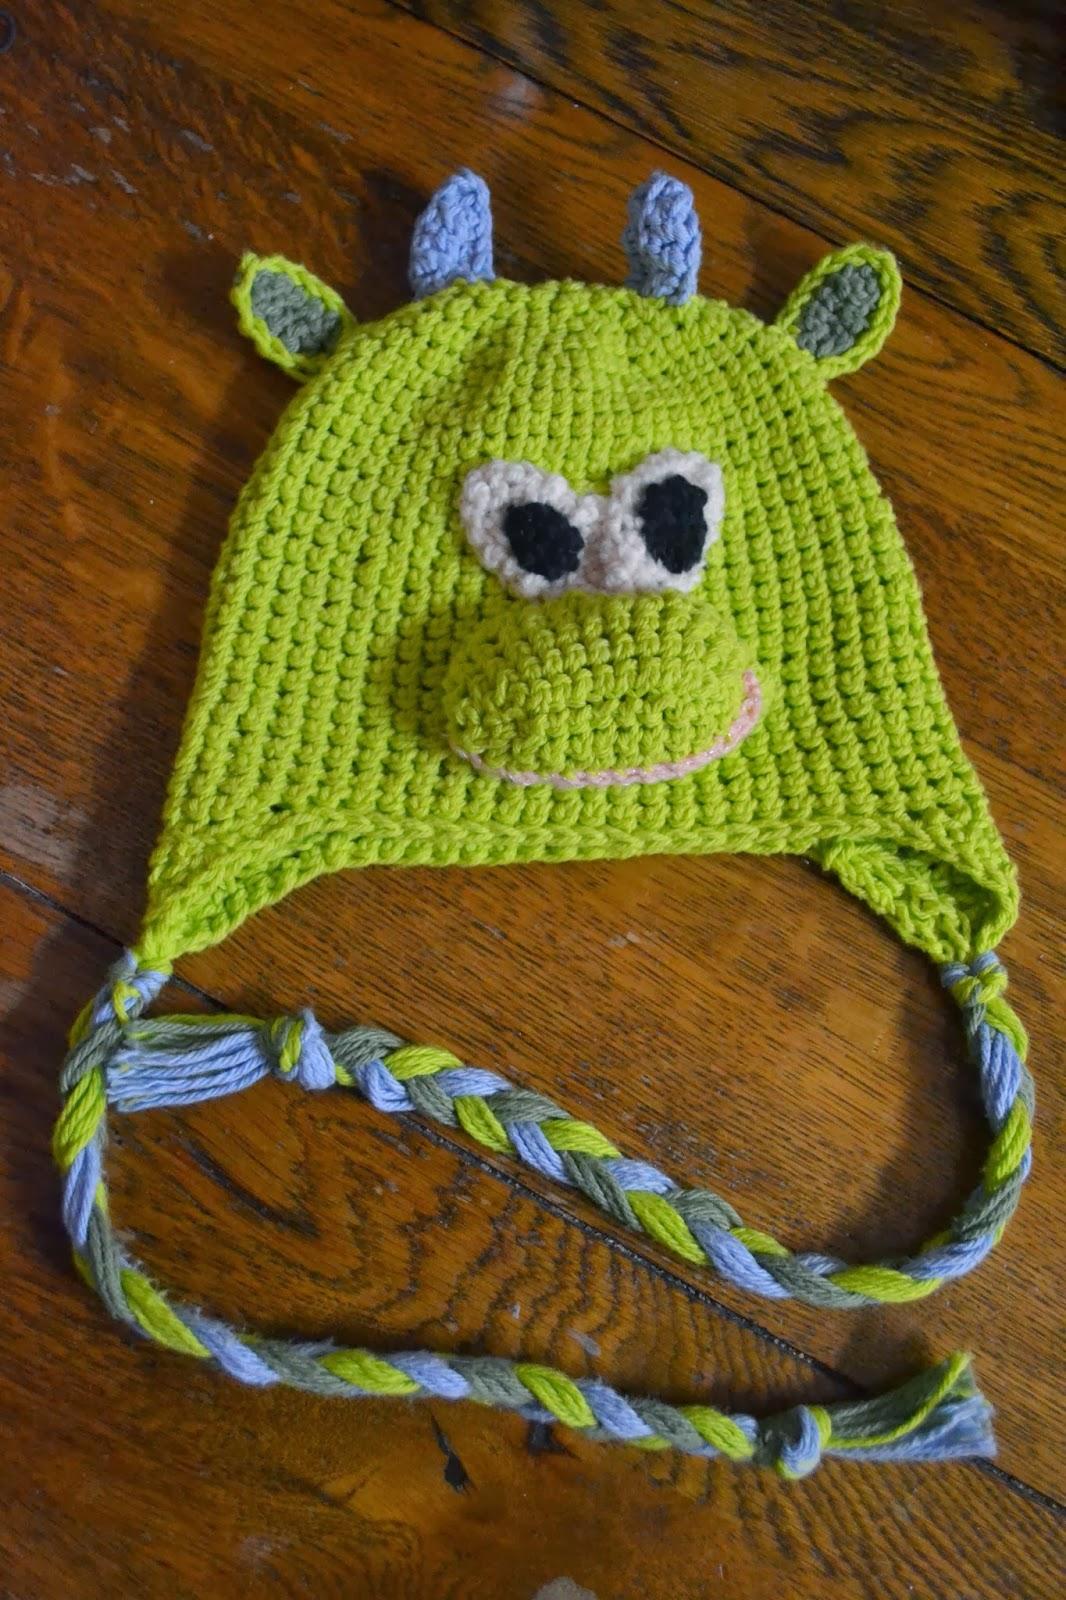 Atot\'s Crafts: Free Pattern Green Dragon / Dinosaur Crochet Hat